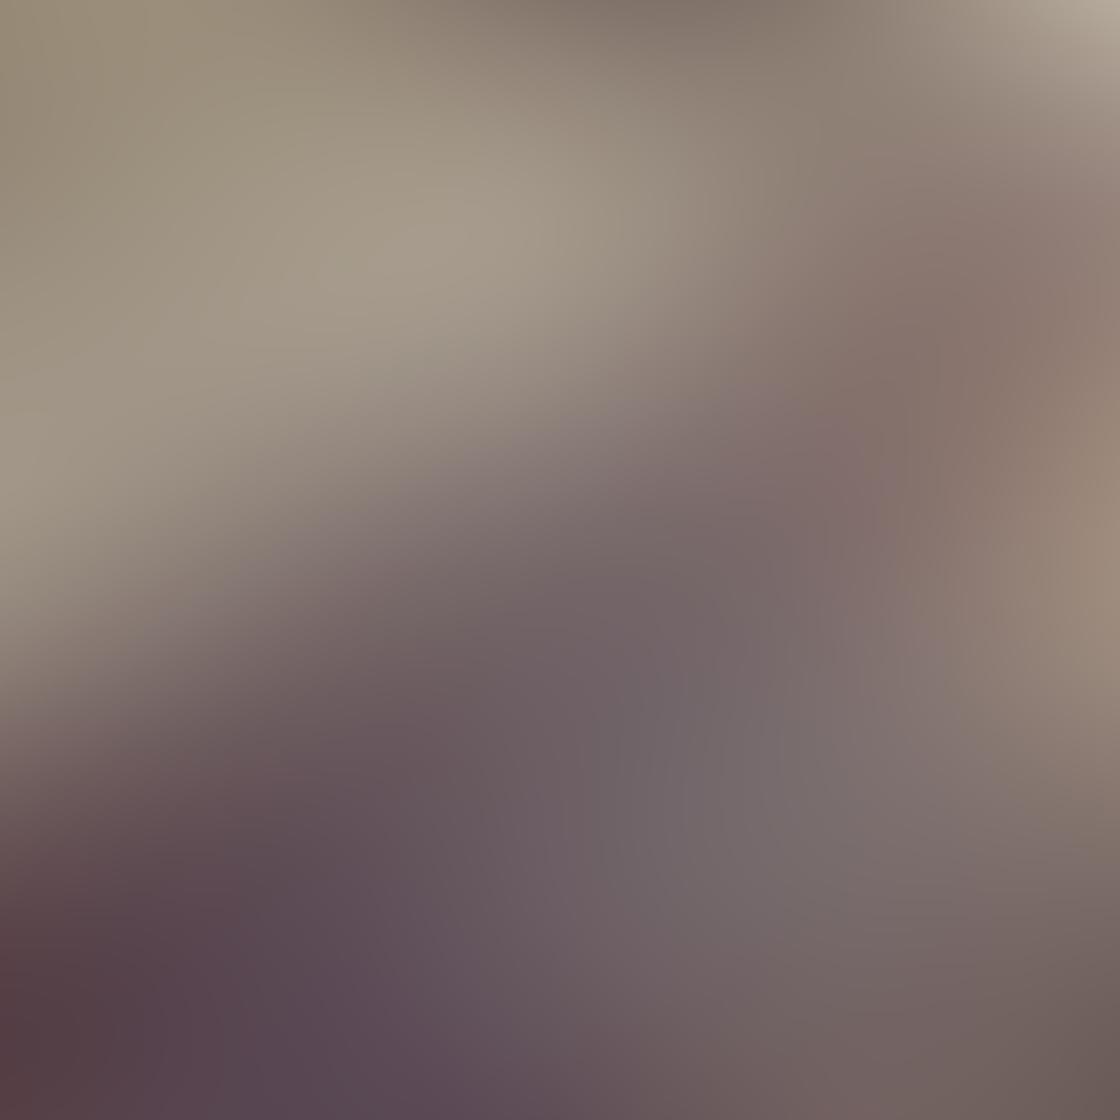 iPhone Angle Photo 14